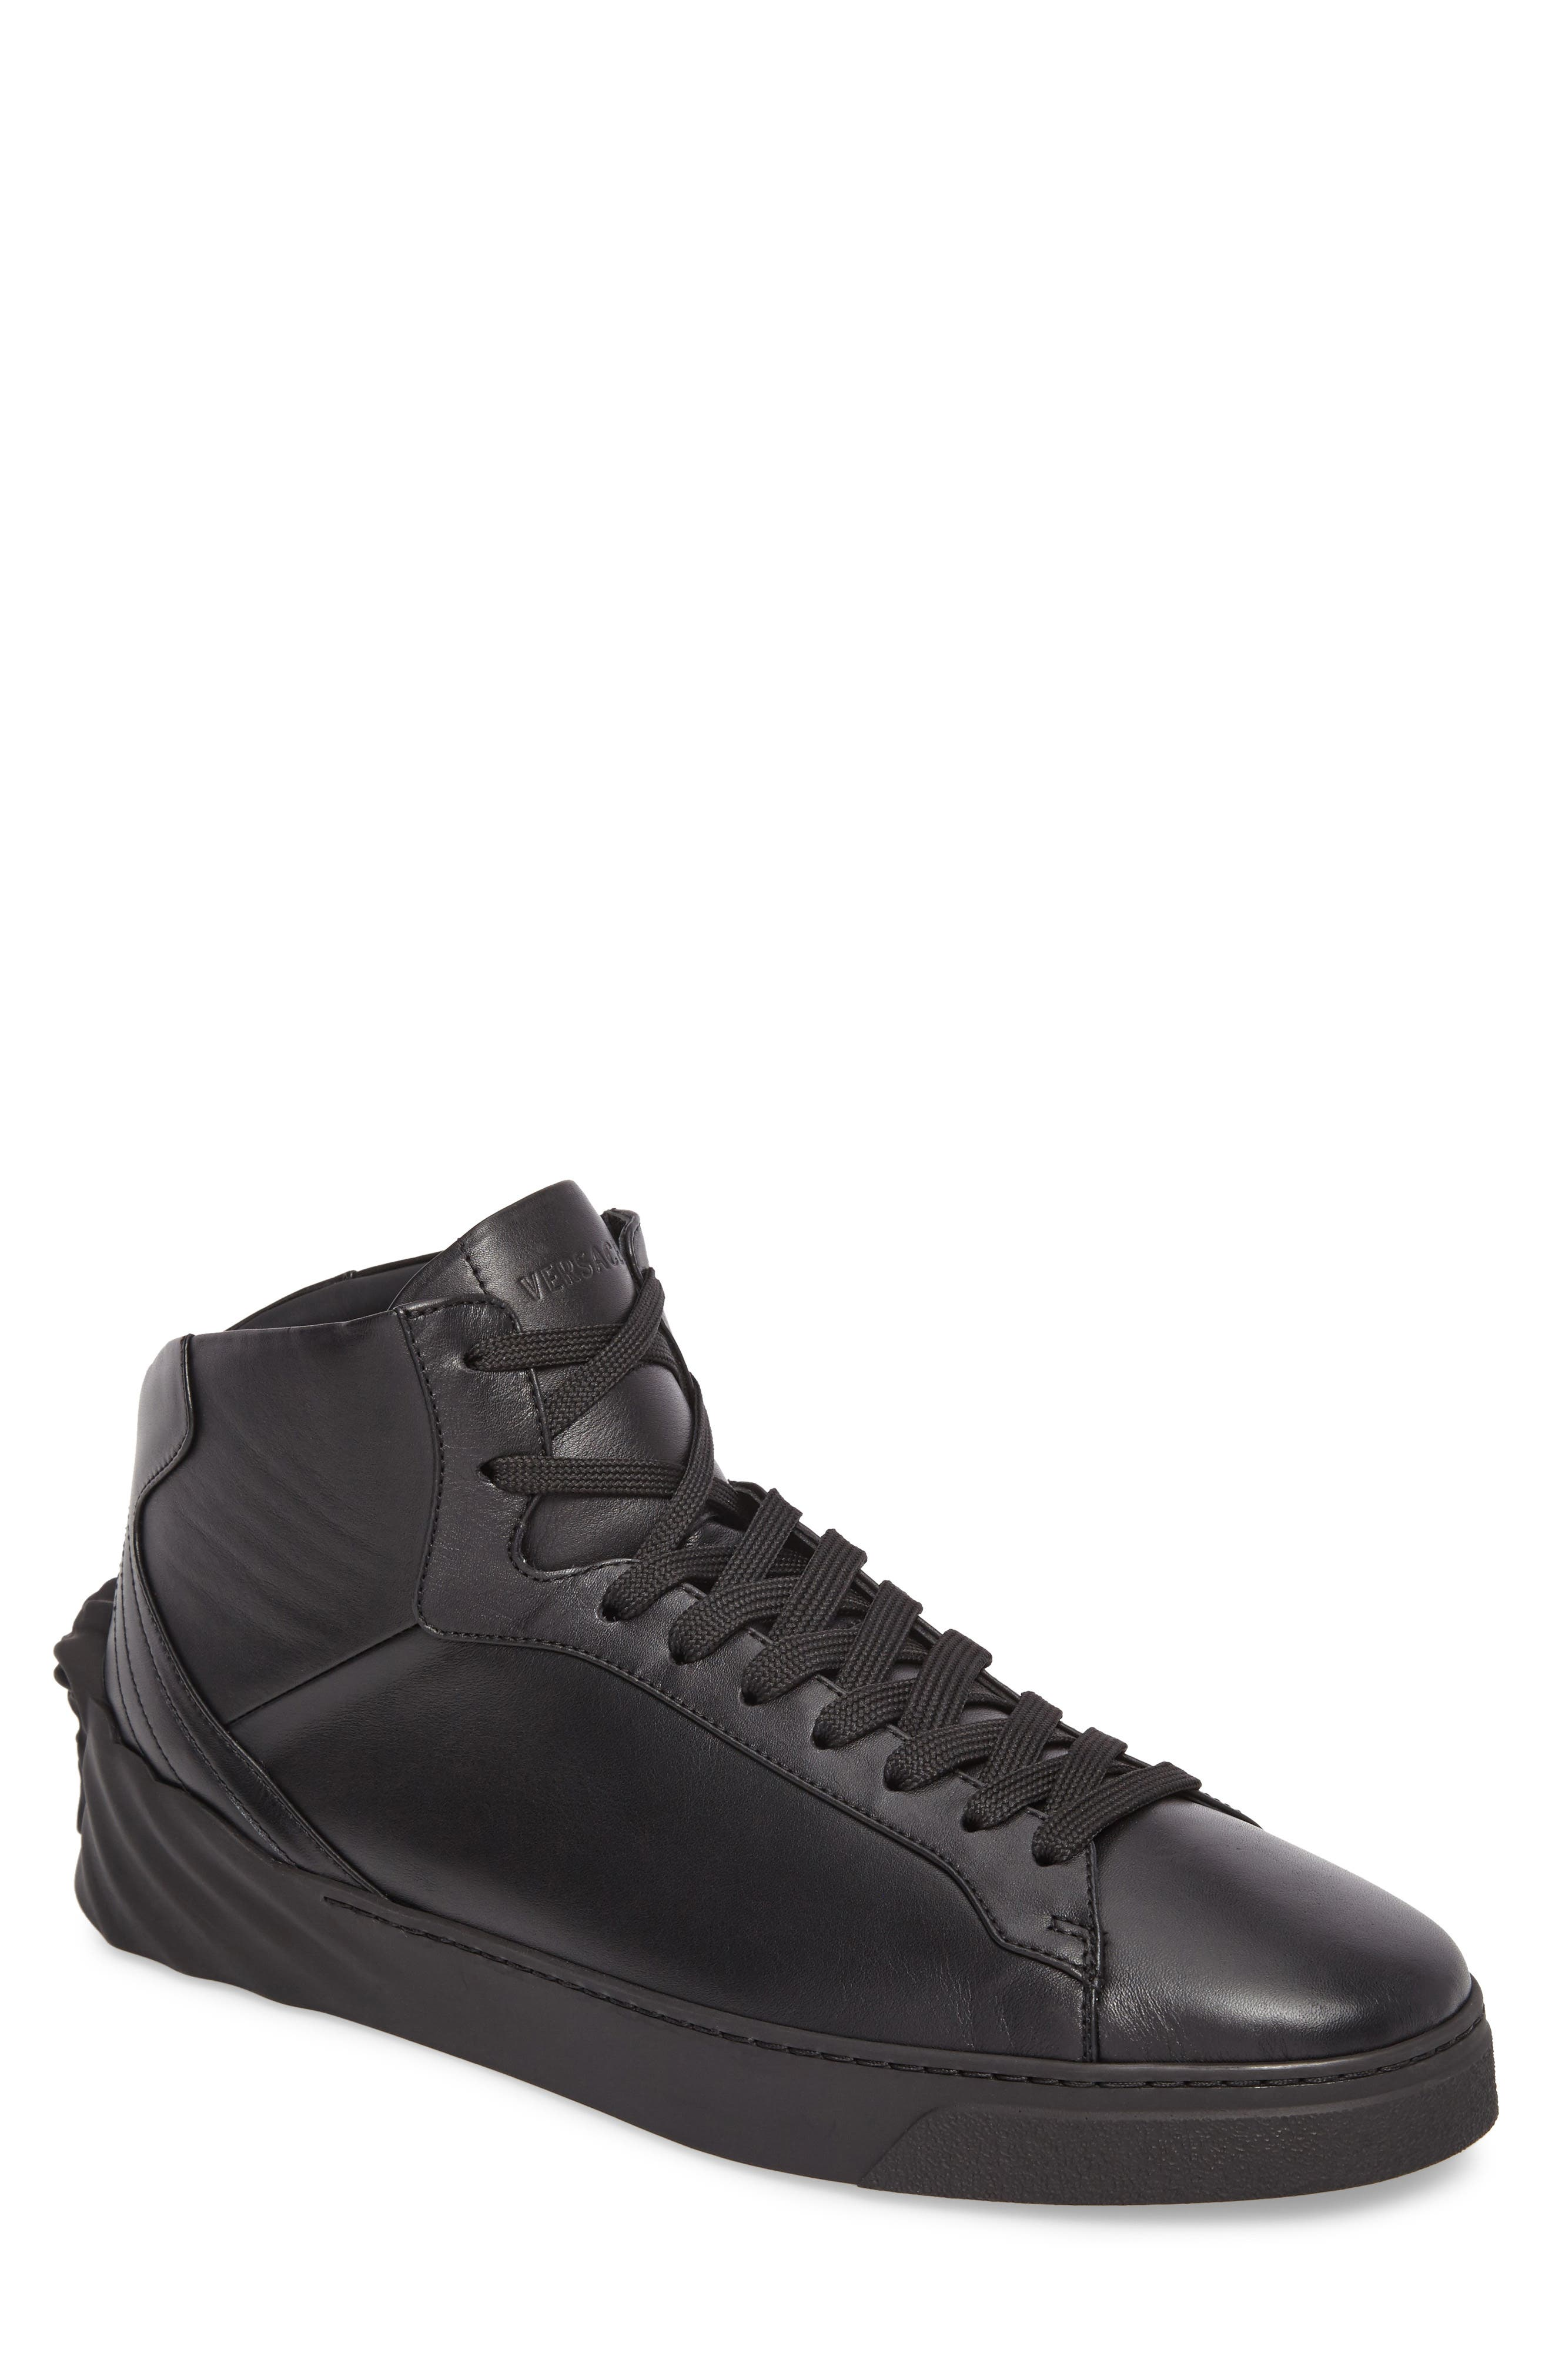 3D Medusa Sneaker,                         Main,                         color, Black